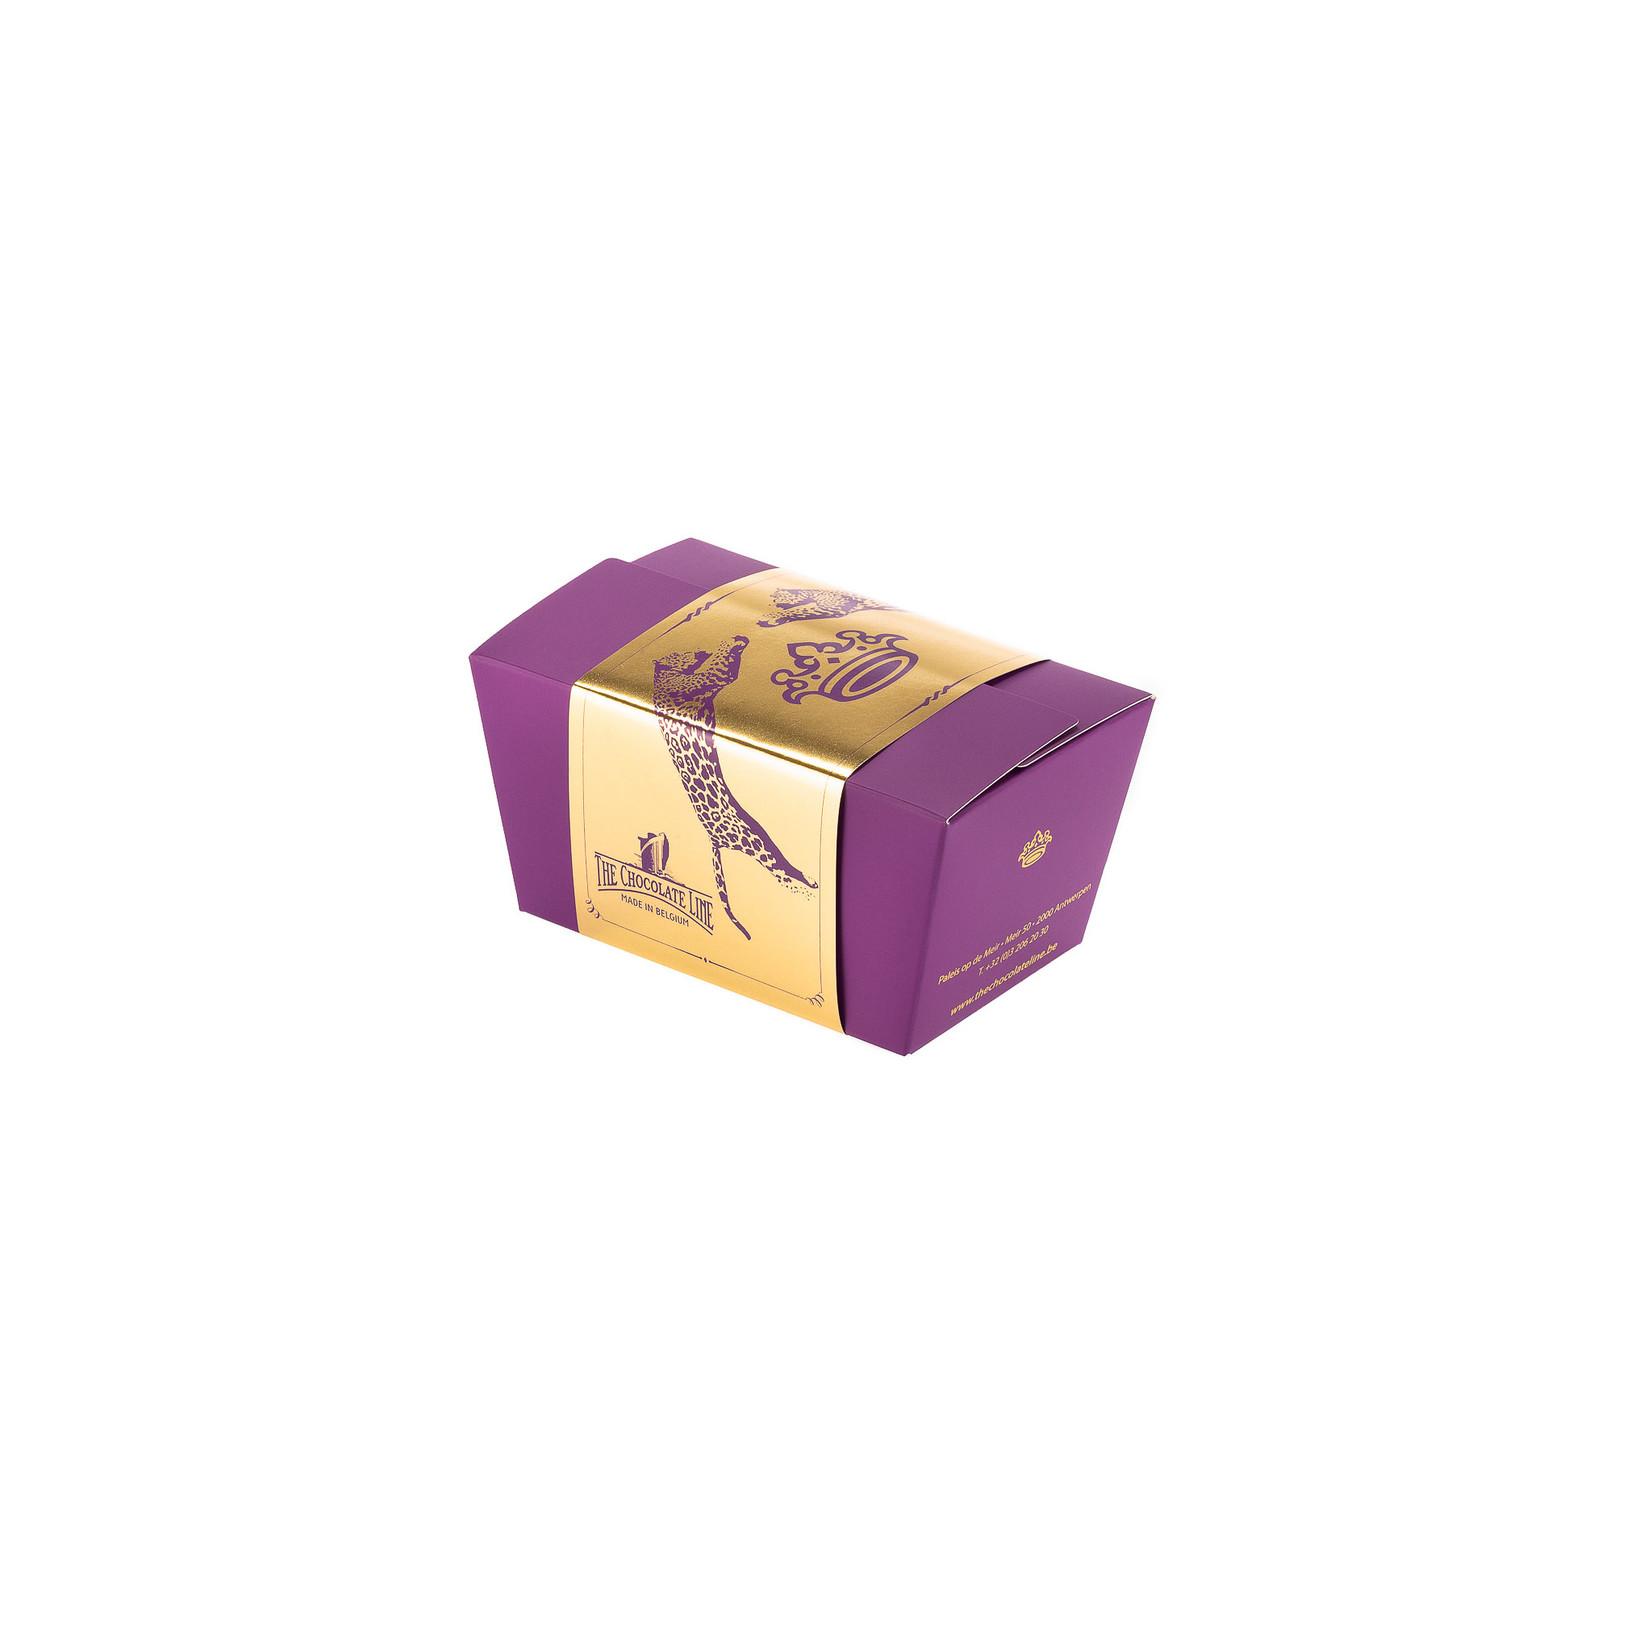 Box of chocolates Paola